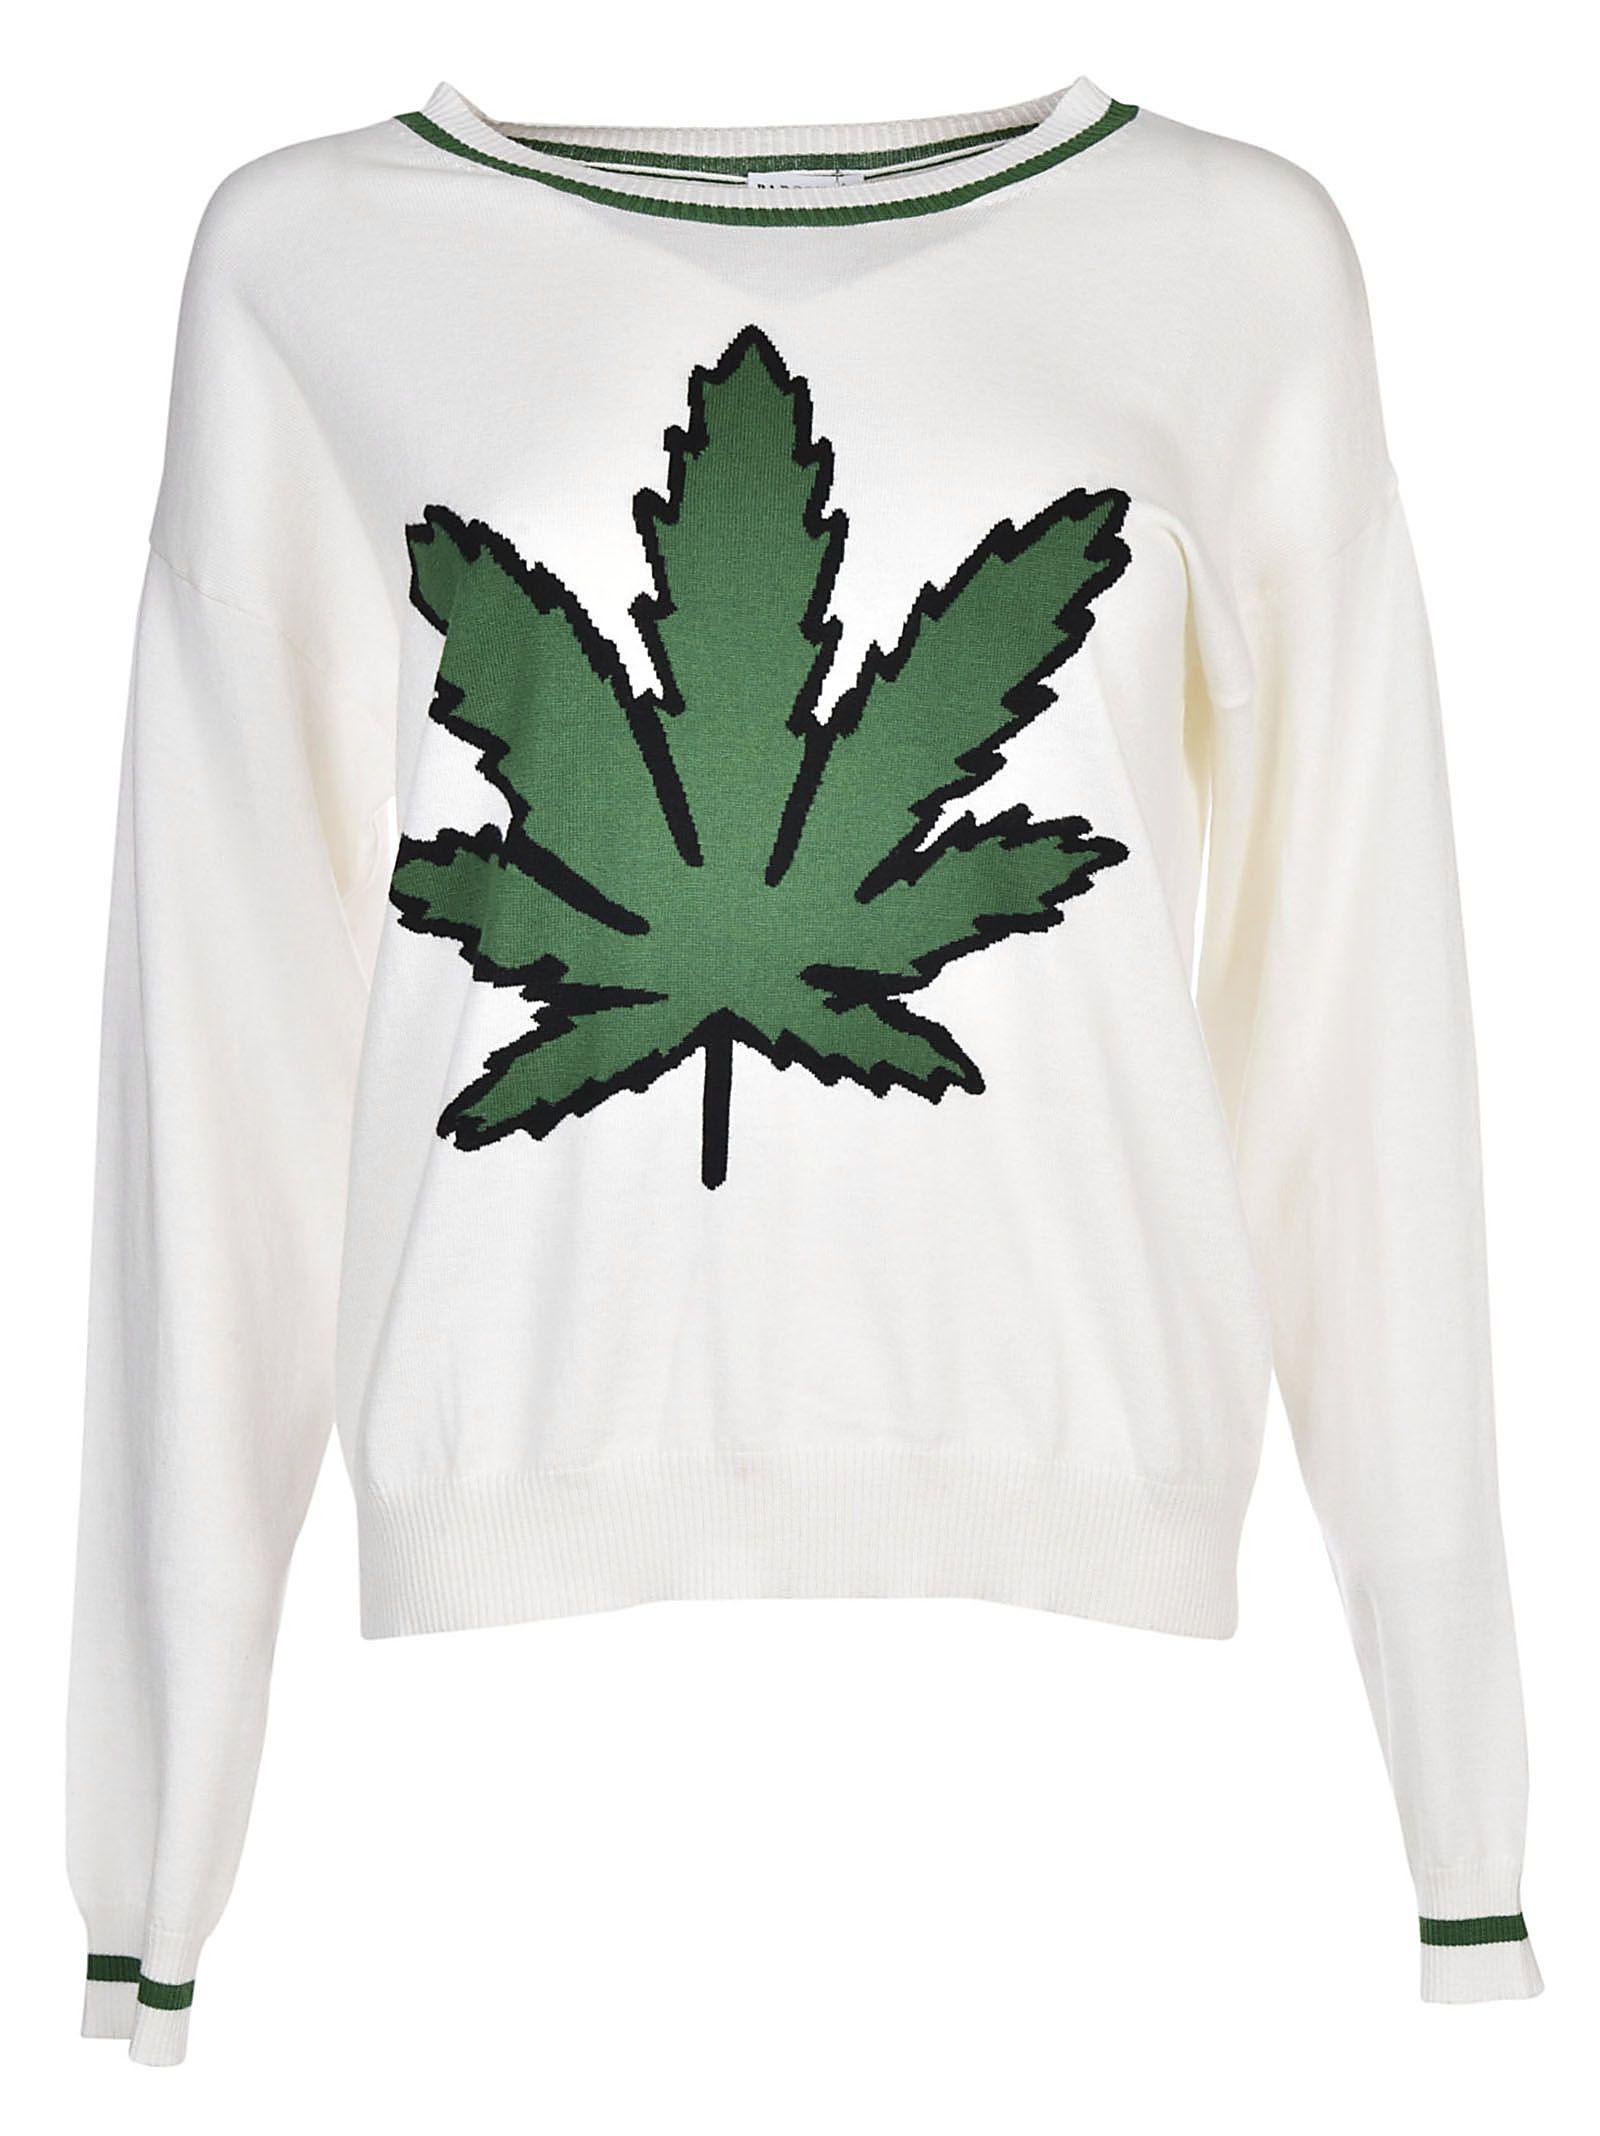 Parosh Go Green Sweatshirt